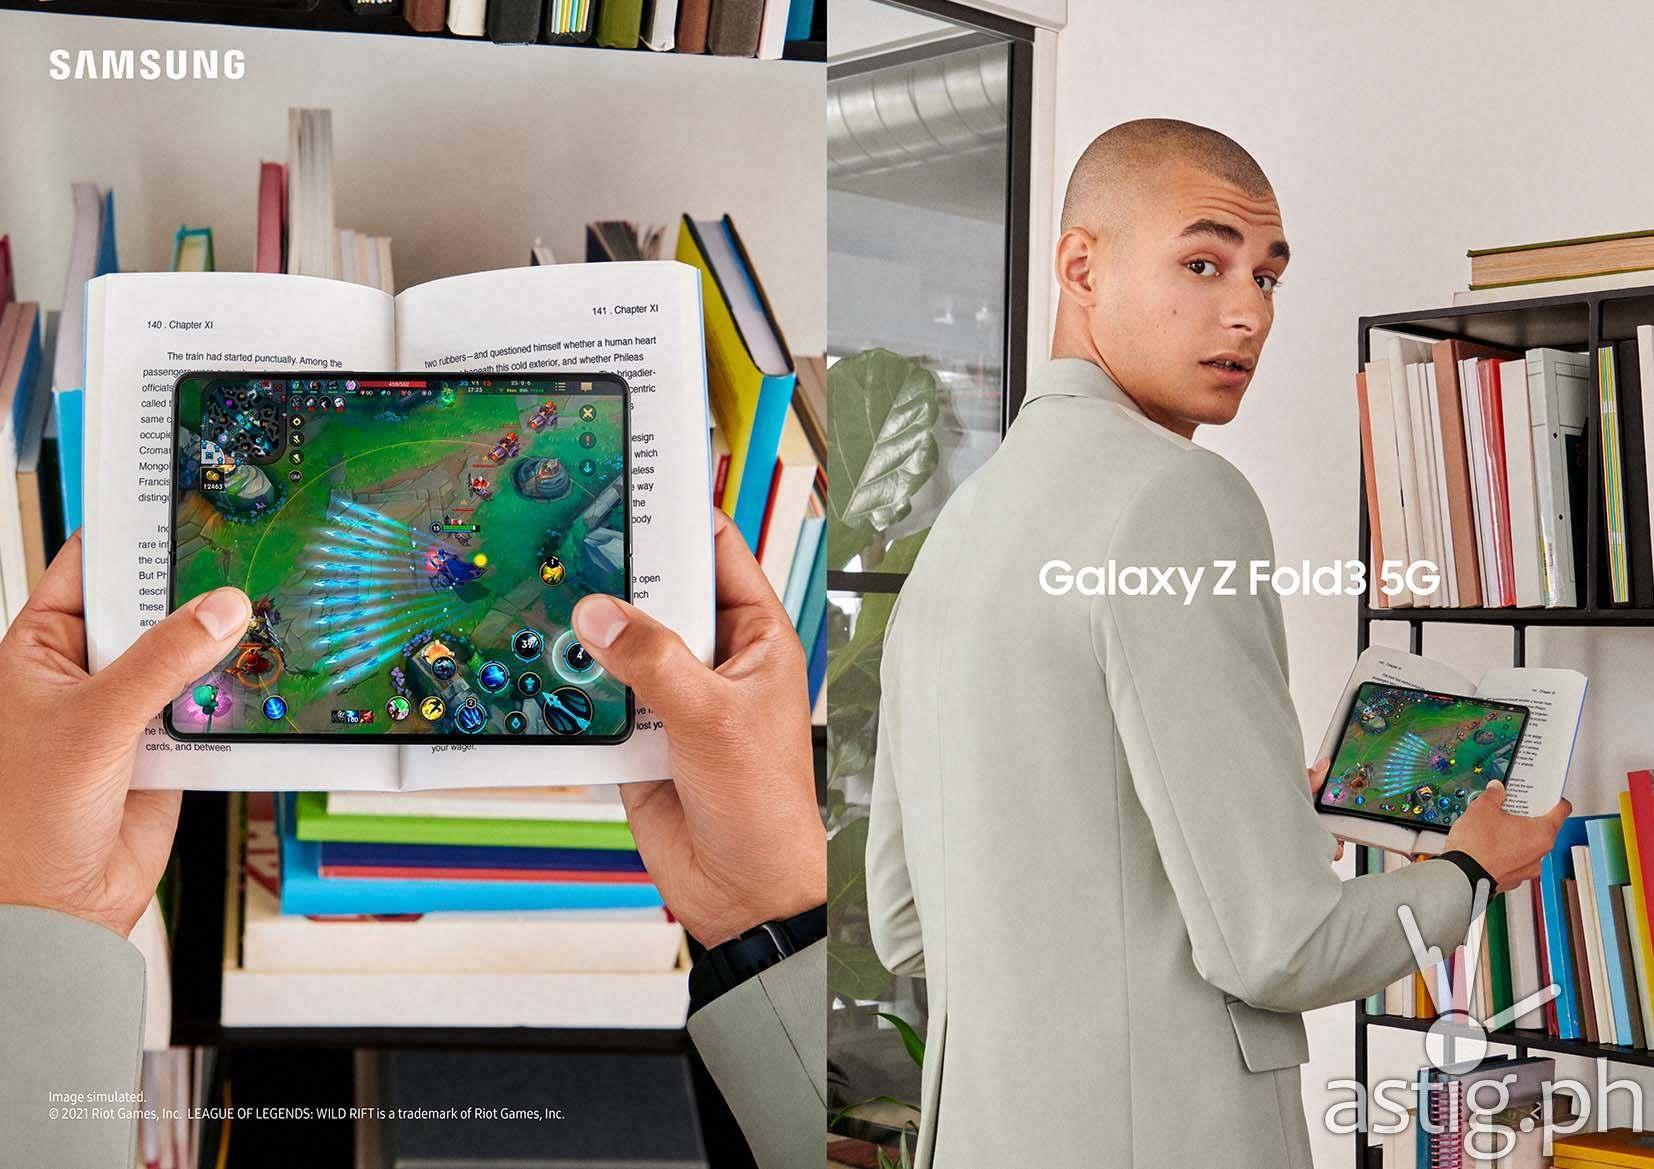 Samsung Galaxy Z Fold3 5G gaming (Philippines)